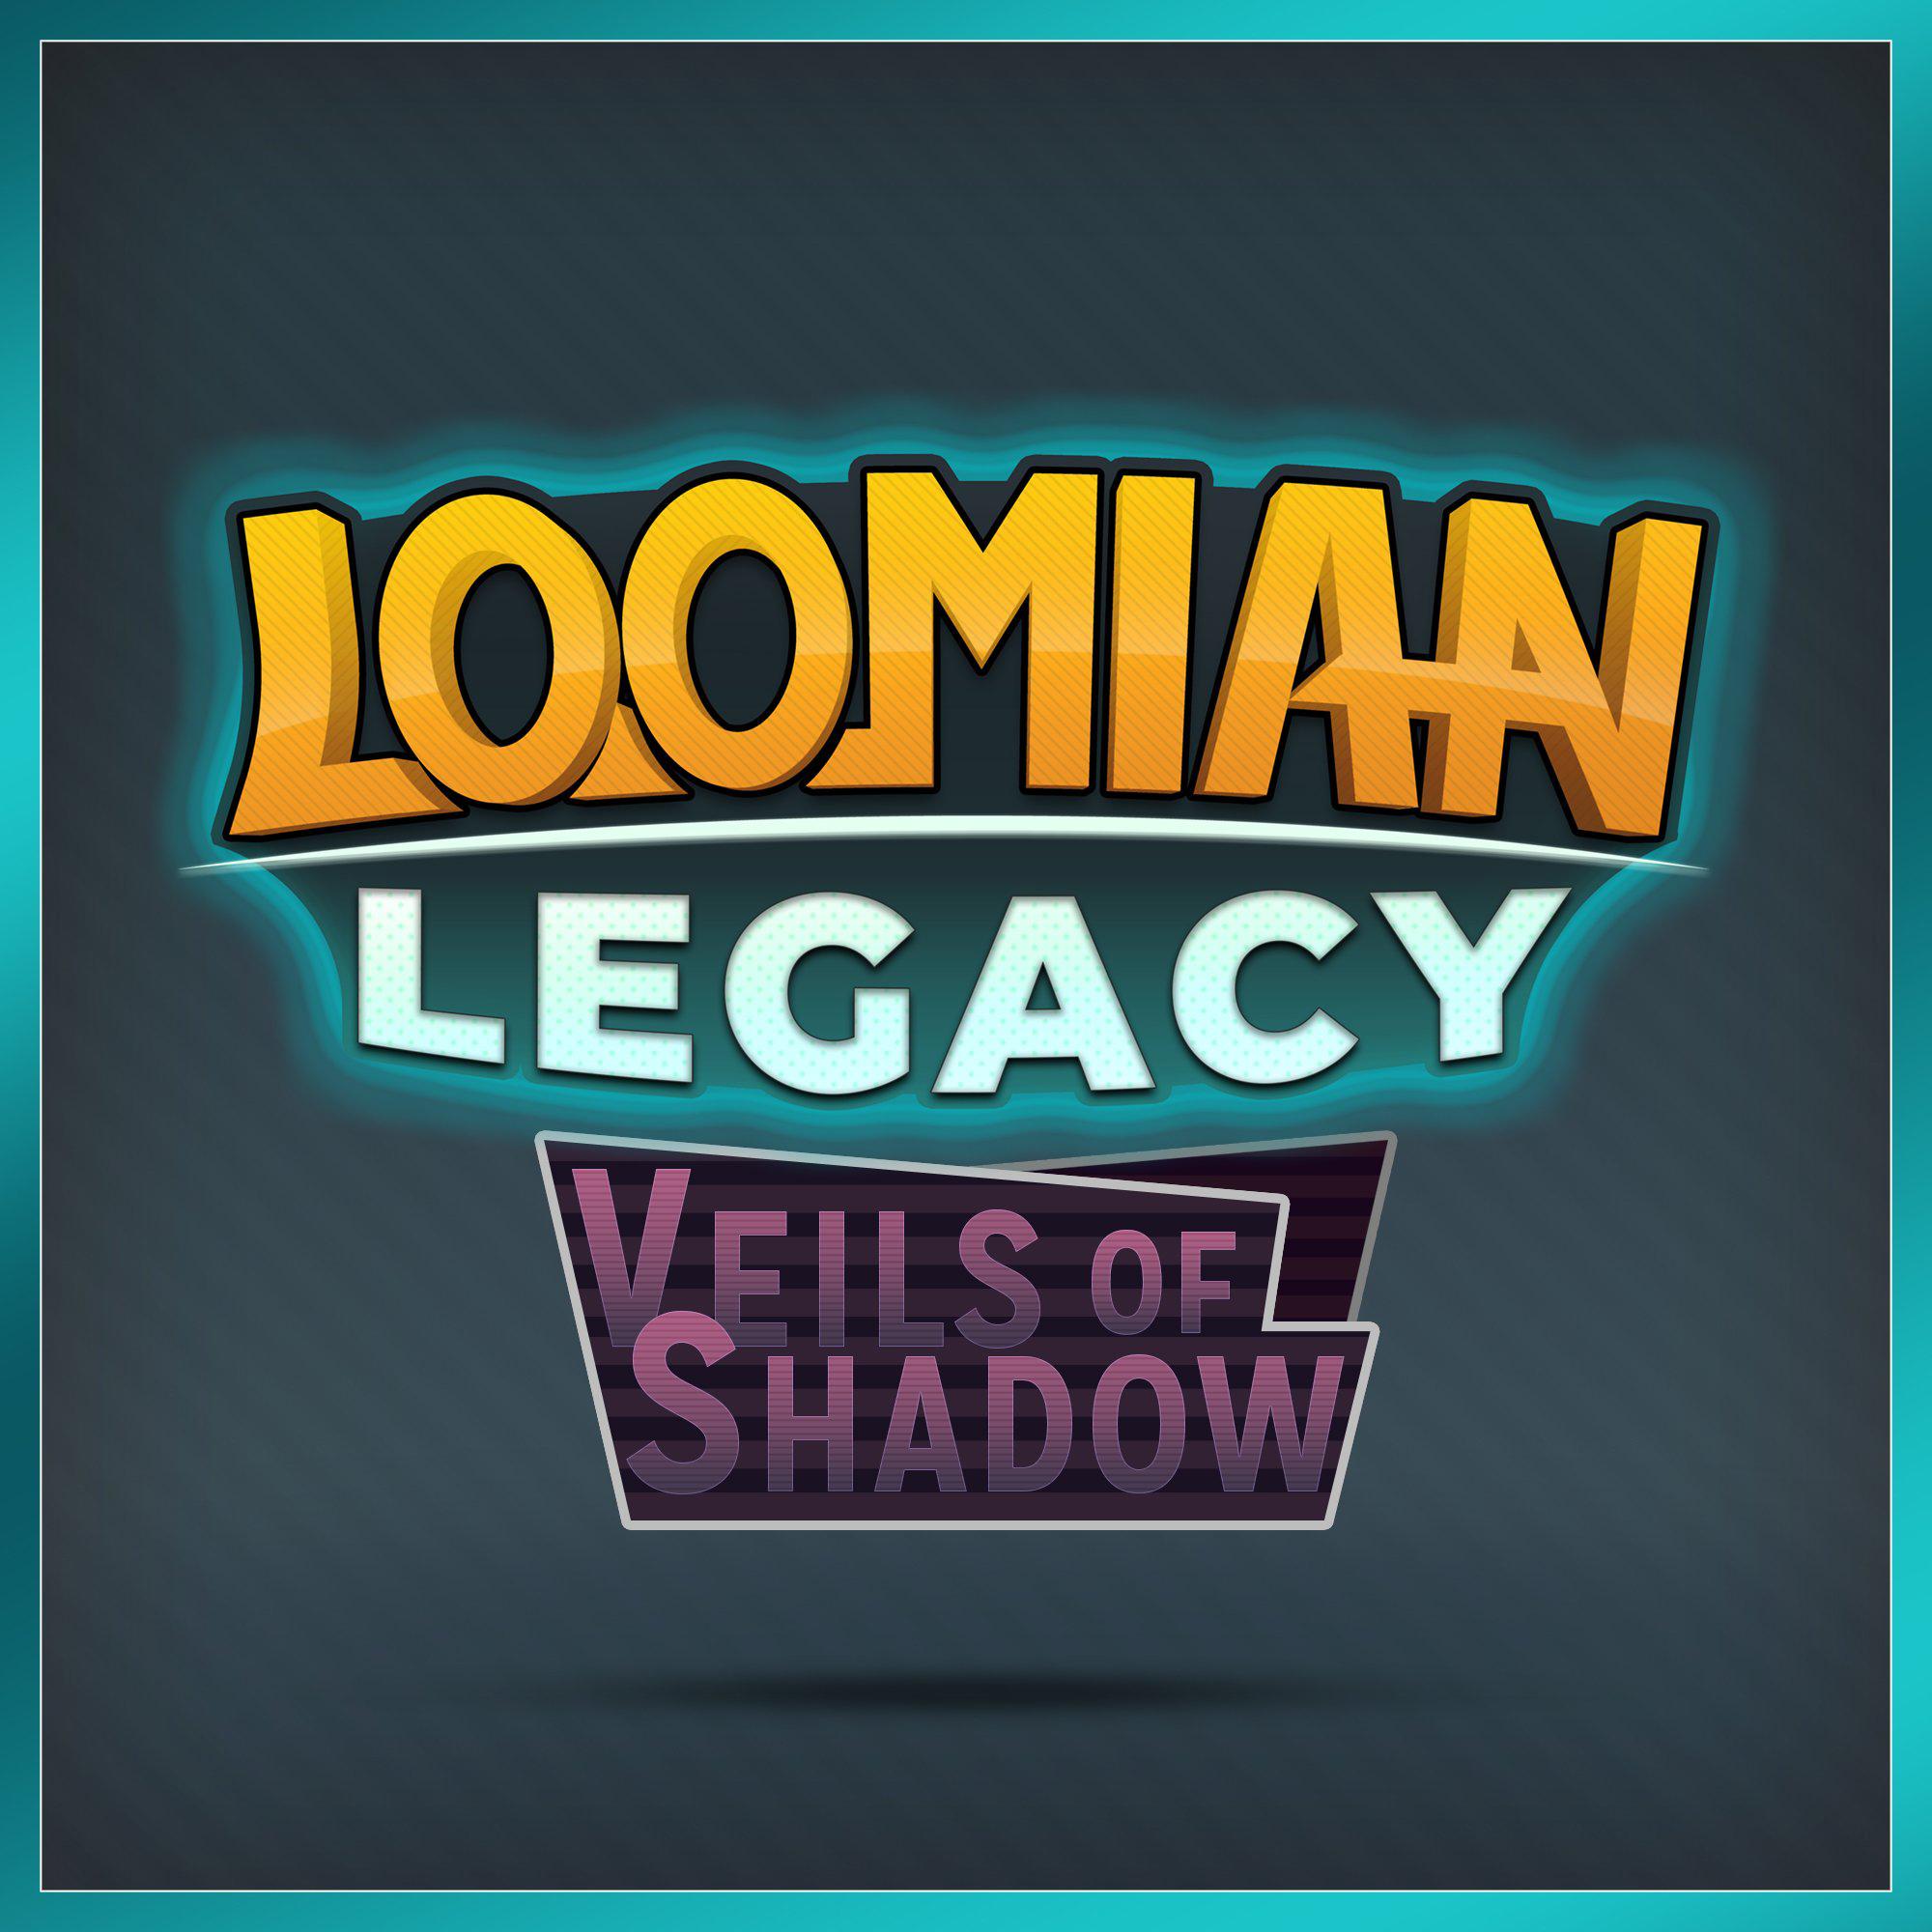 Loomian Legacy Logo